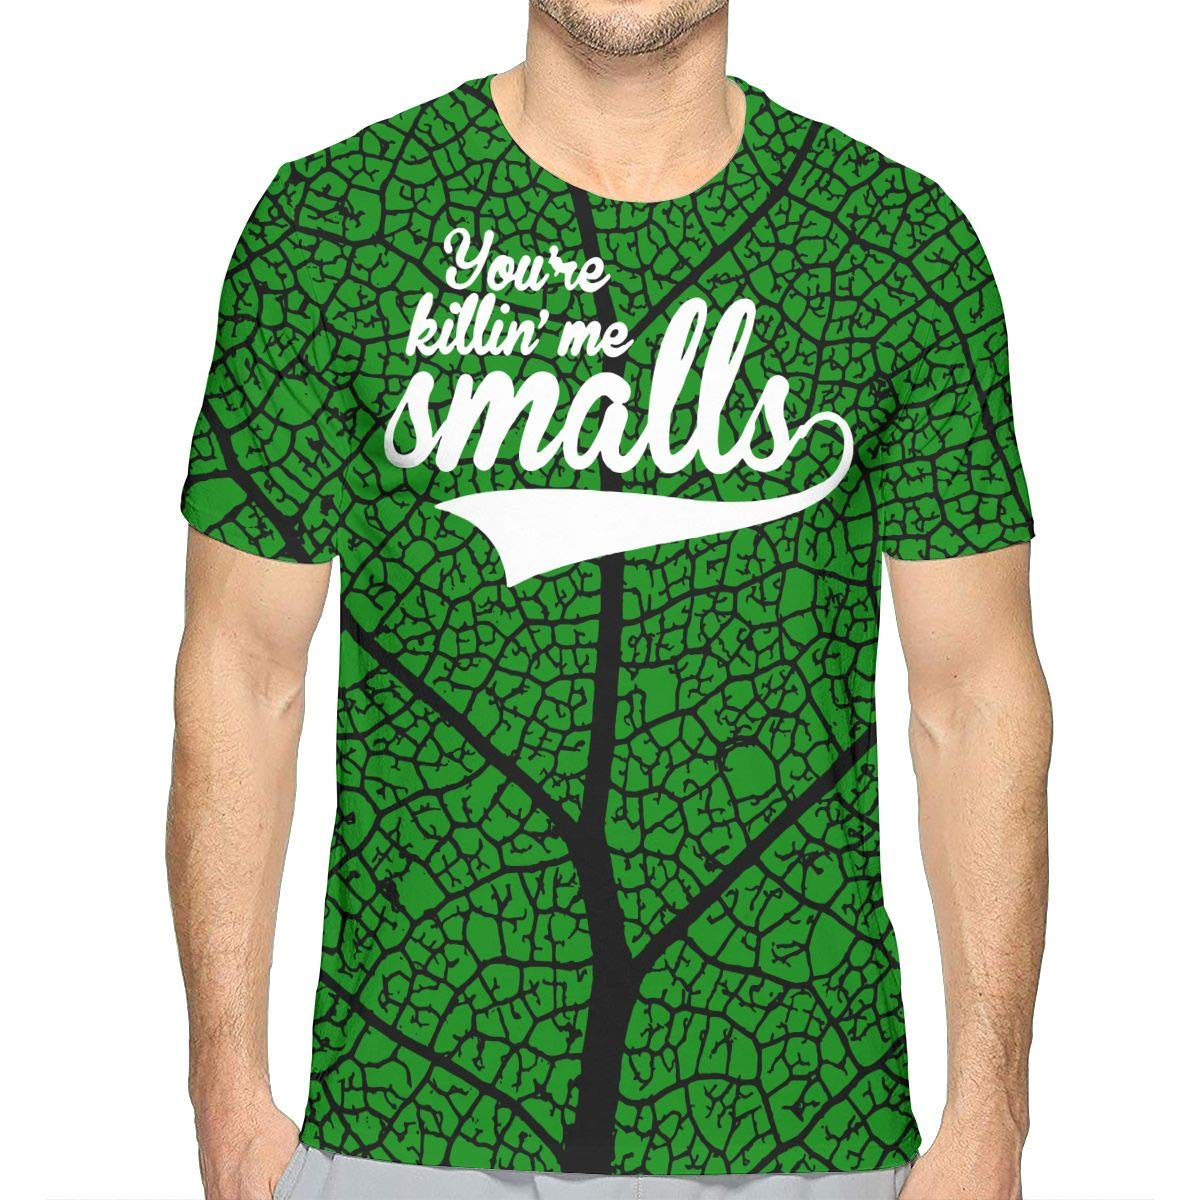 Mens Cool Short Sleeve Tshirts JJKKFG-H Youre Killing Me Smalls